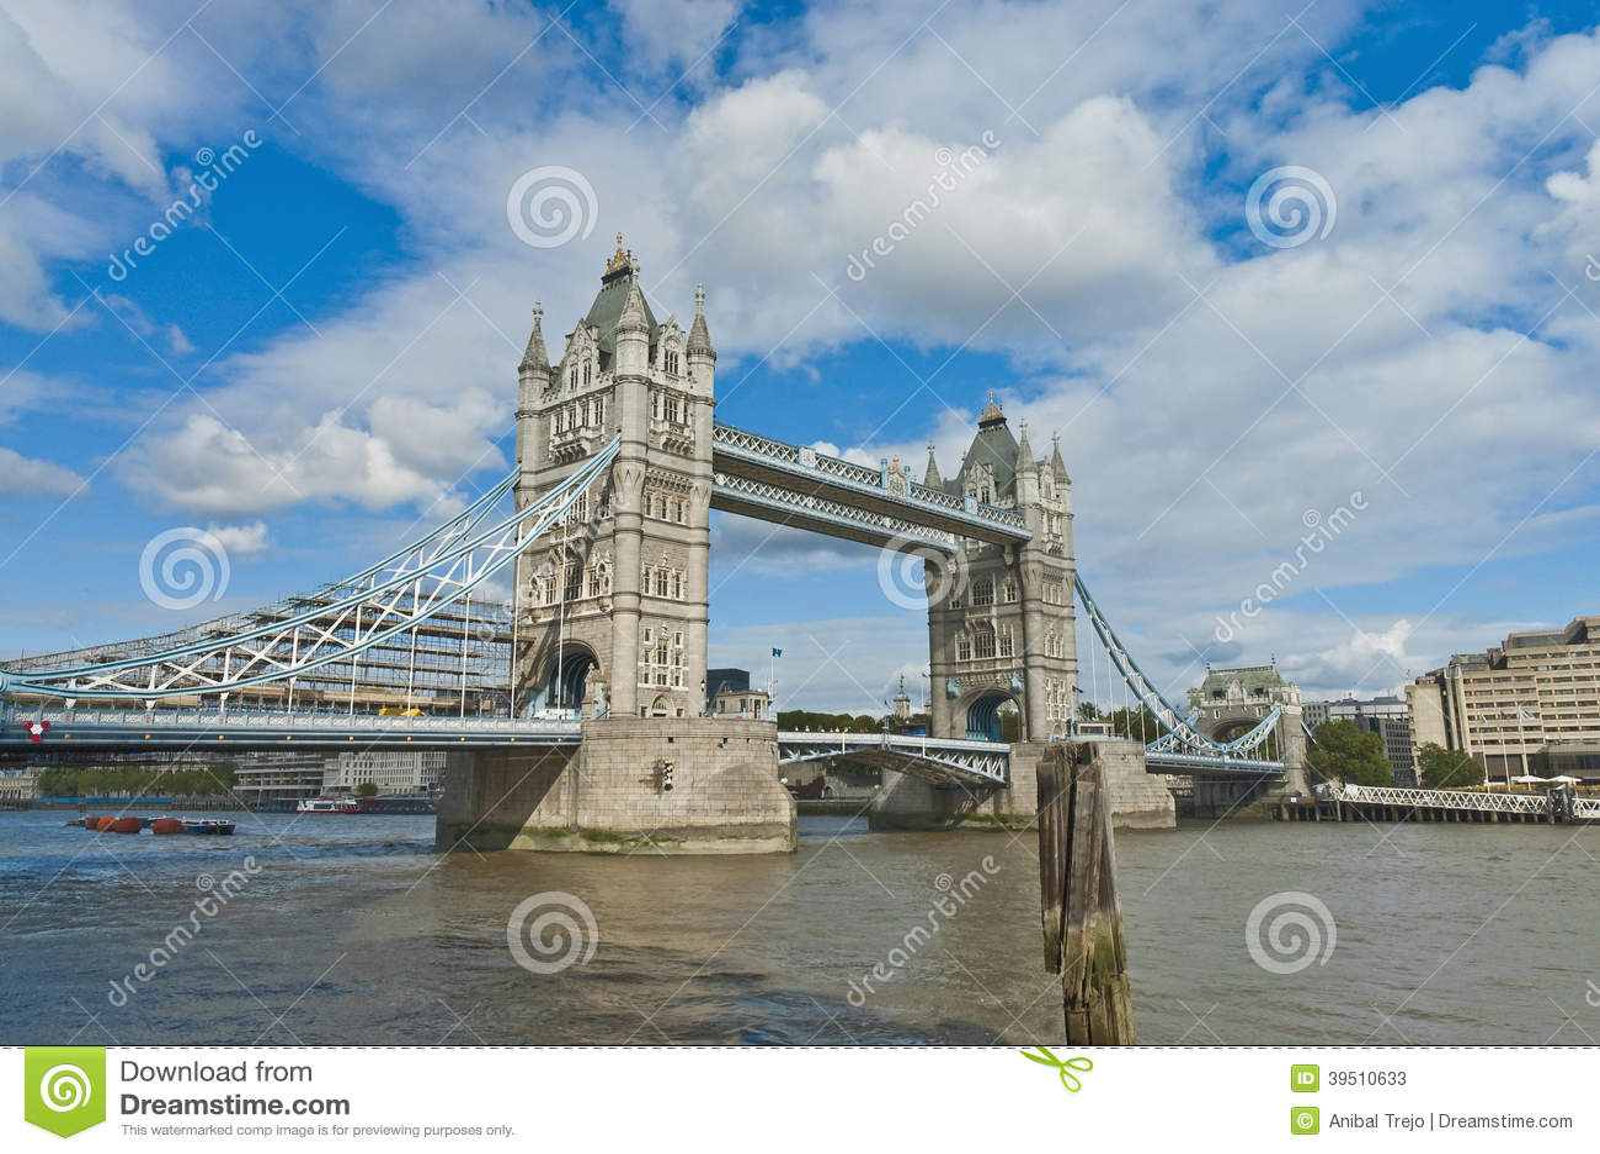 Download London Tower Bridge stock image. Image of edifices, capital - 39510633